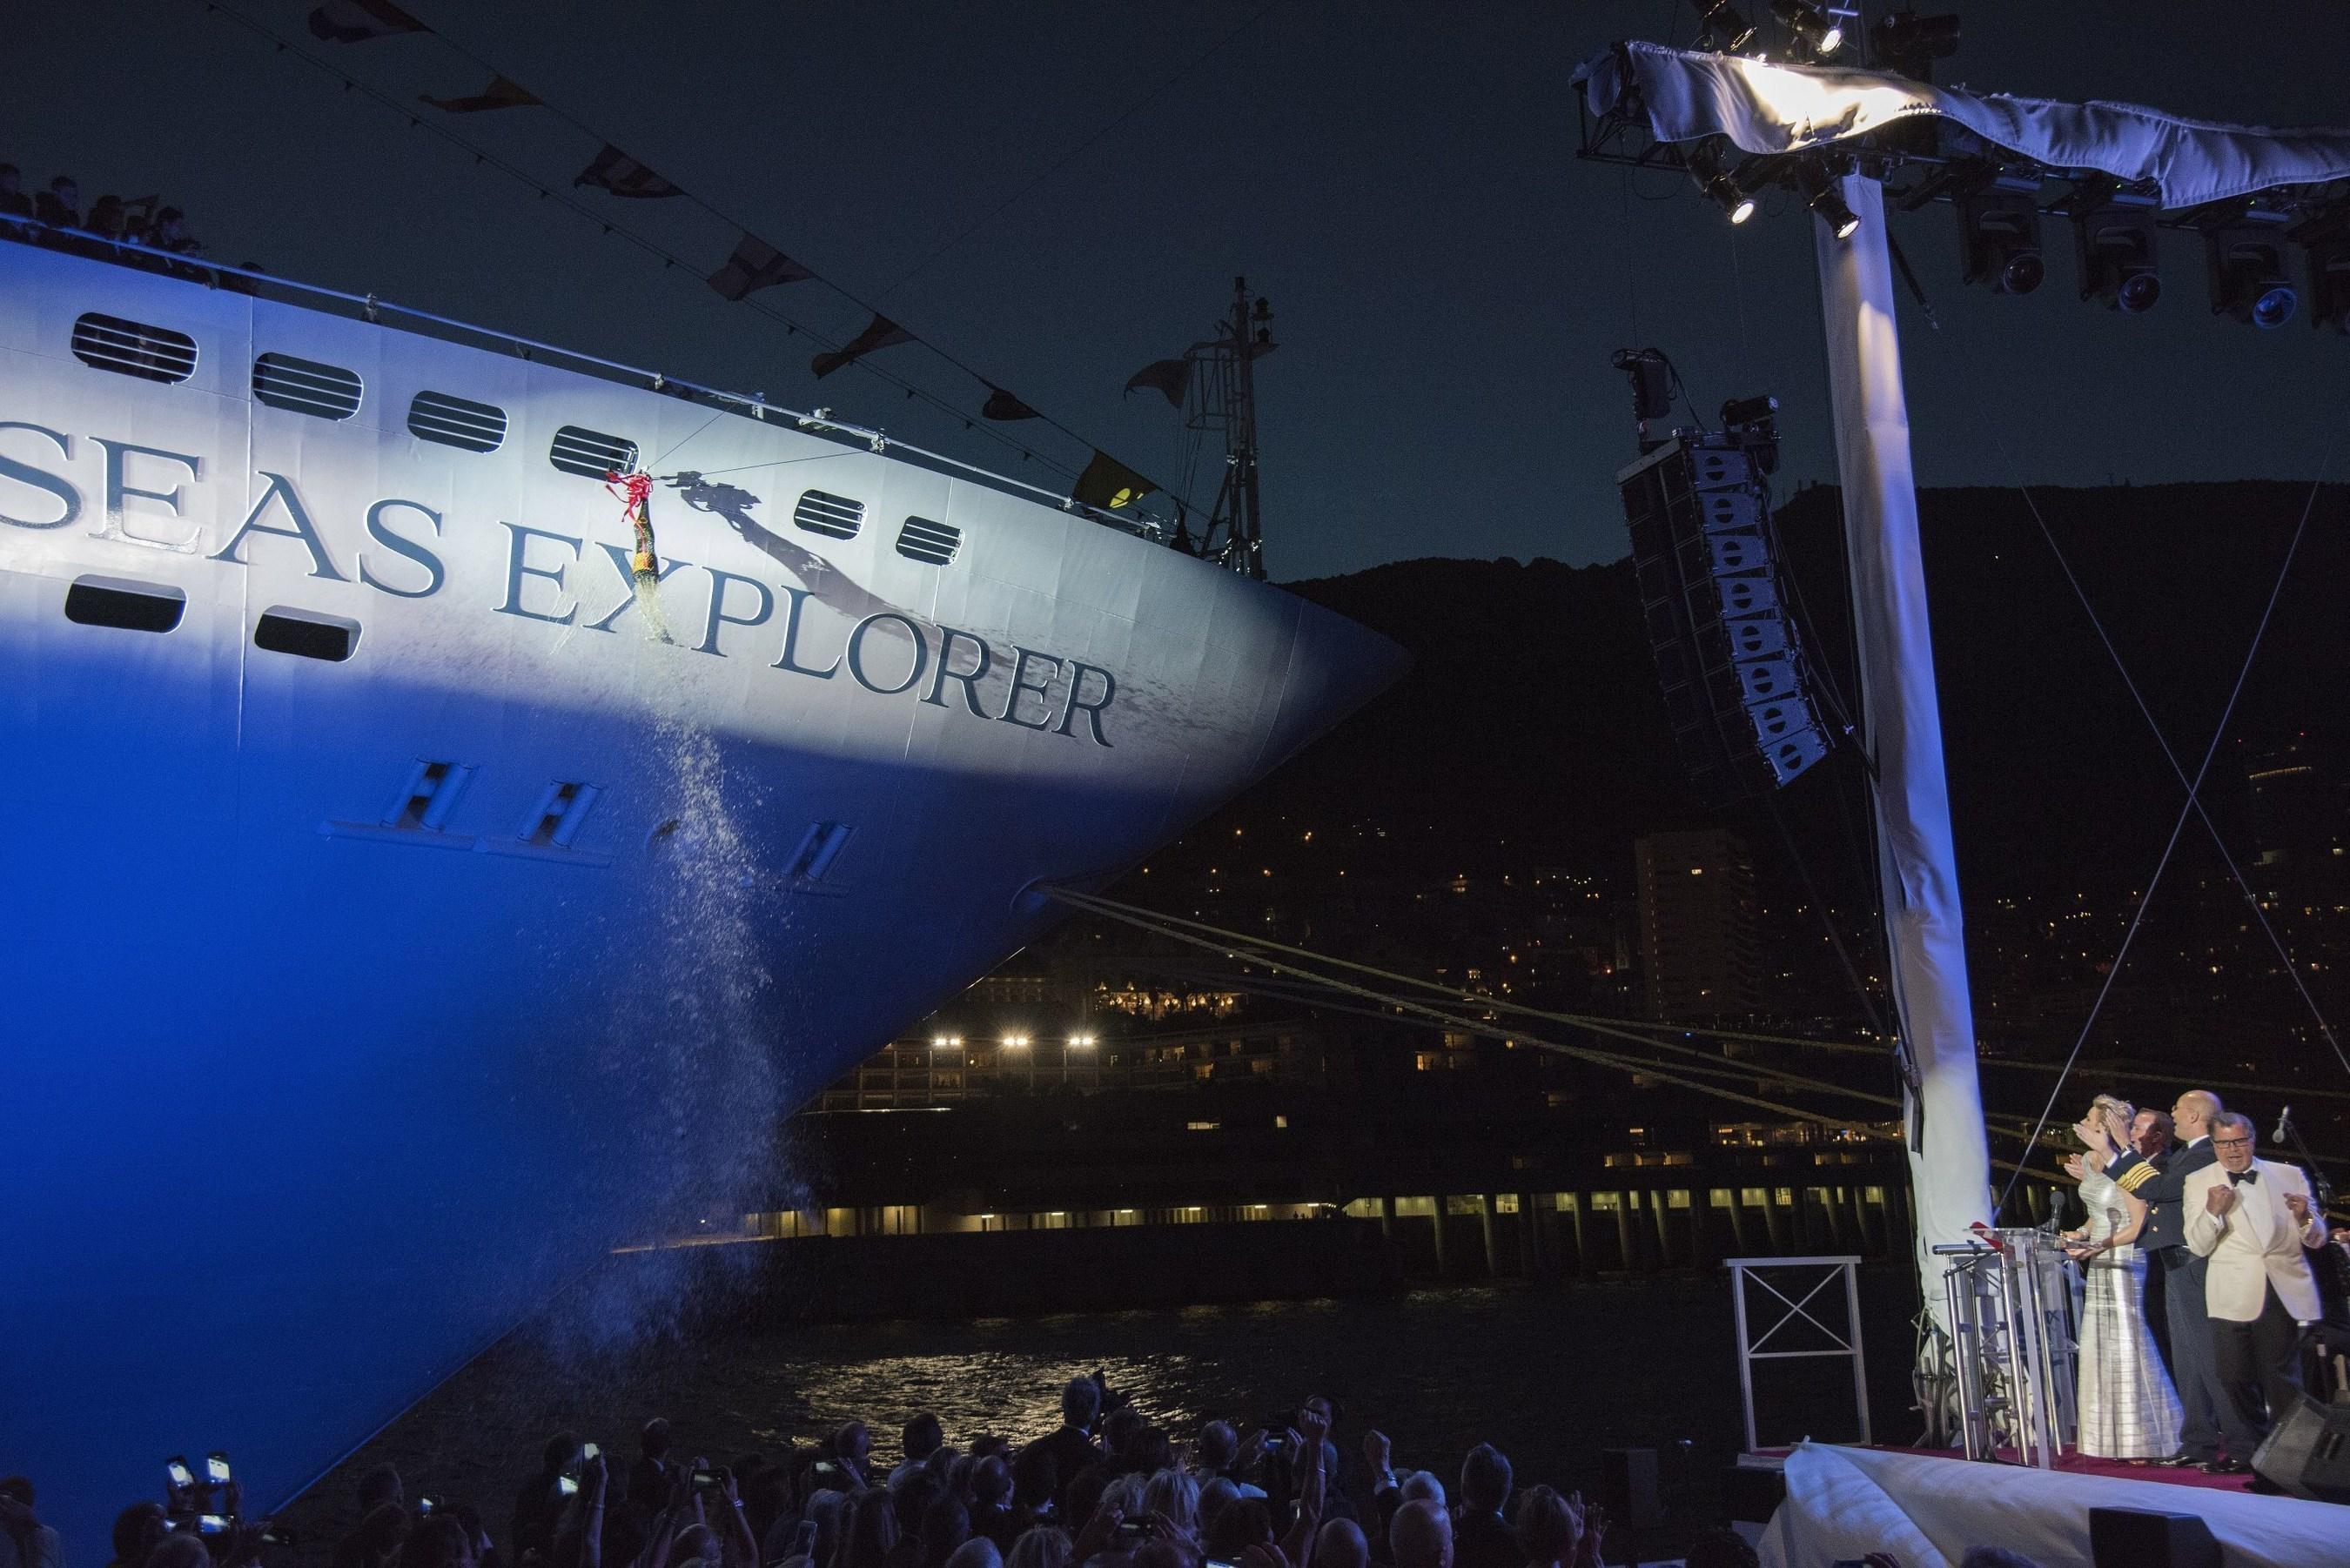 Regent Seven Seas Cruises introduces Seven Seas Explorer to its fleet with this bottle-breaking christening moment. Photo credit: Preston Mack.